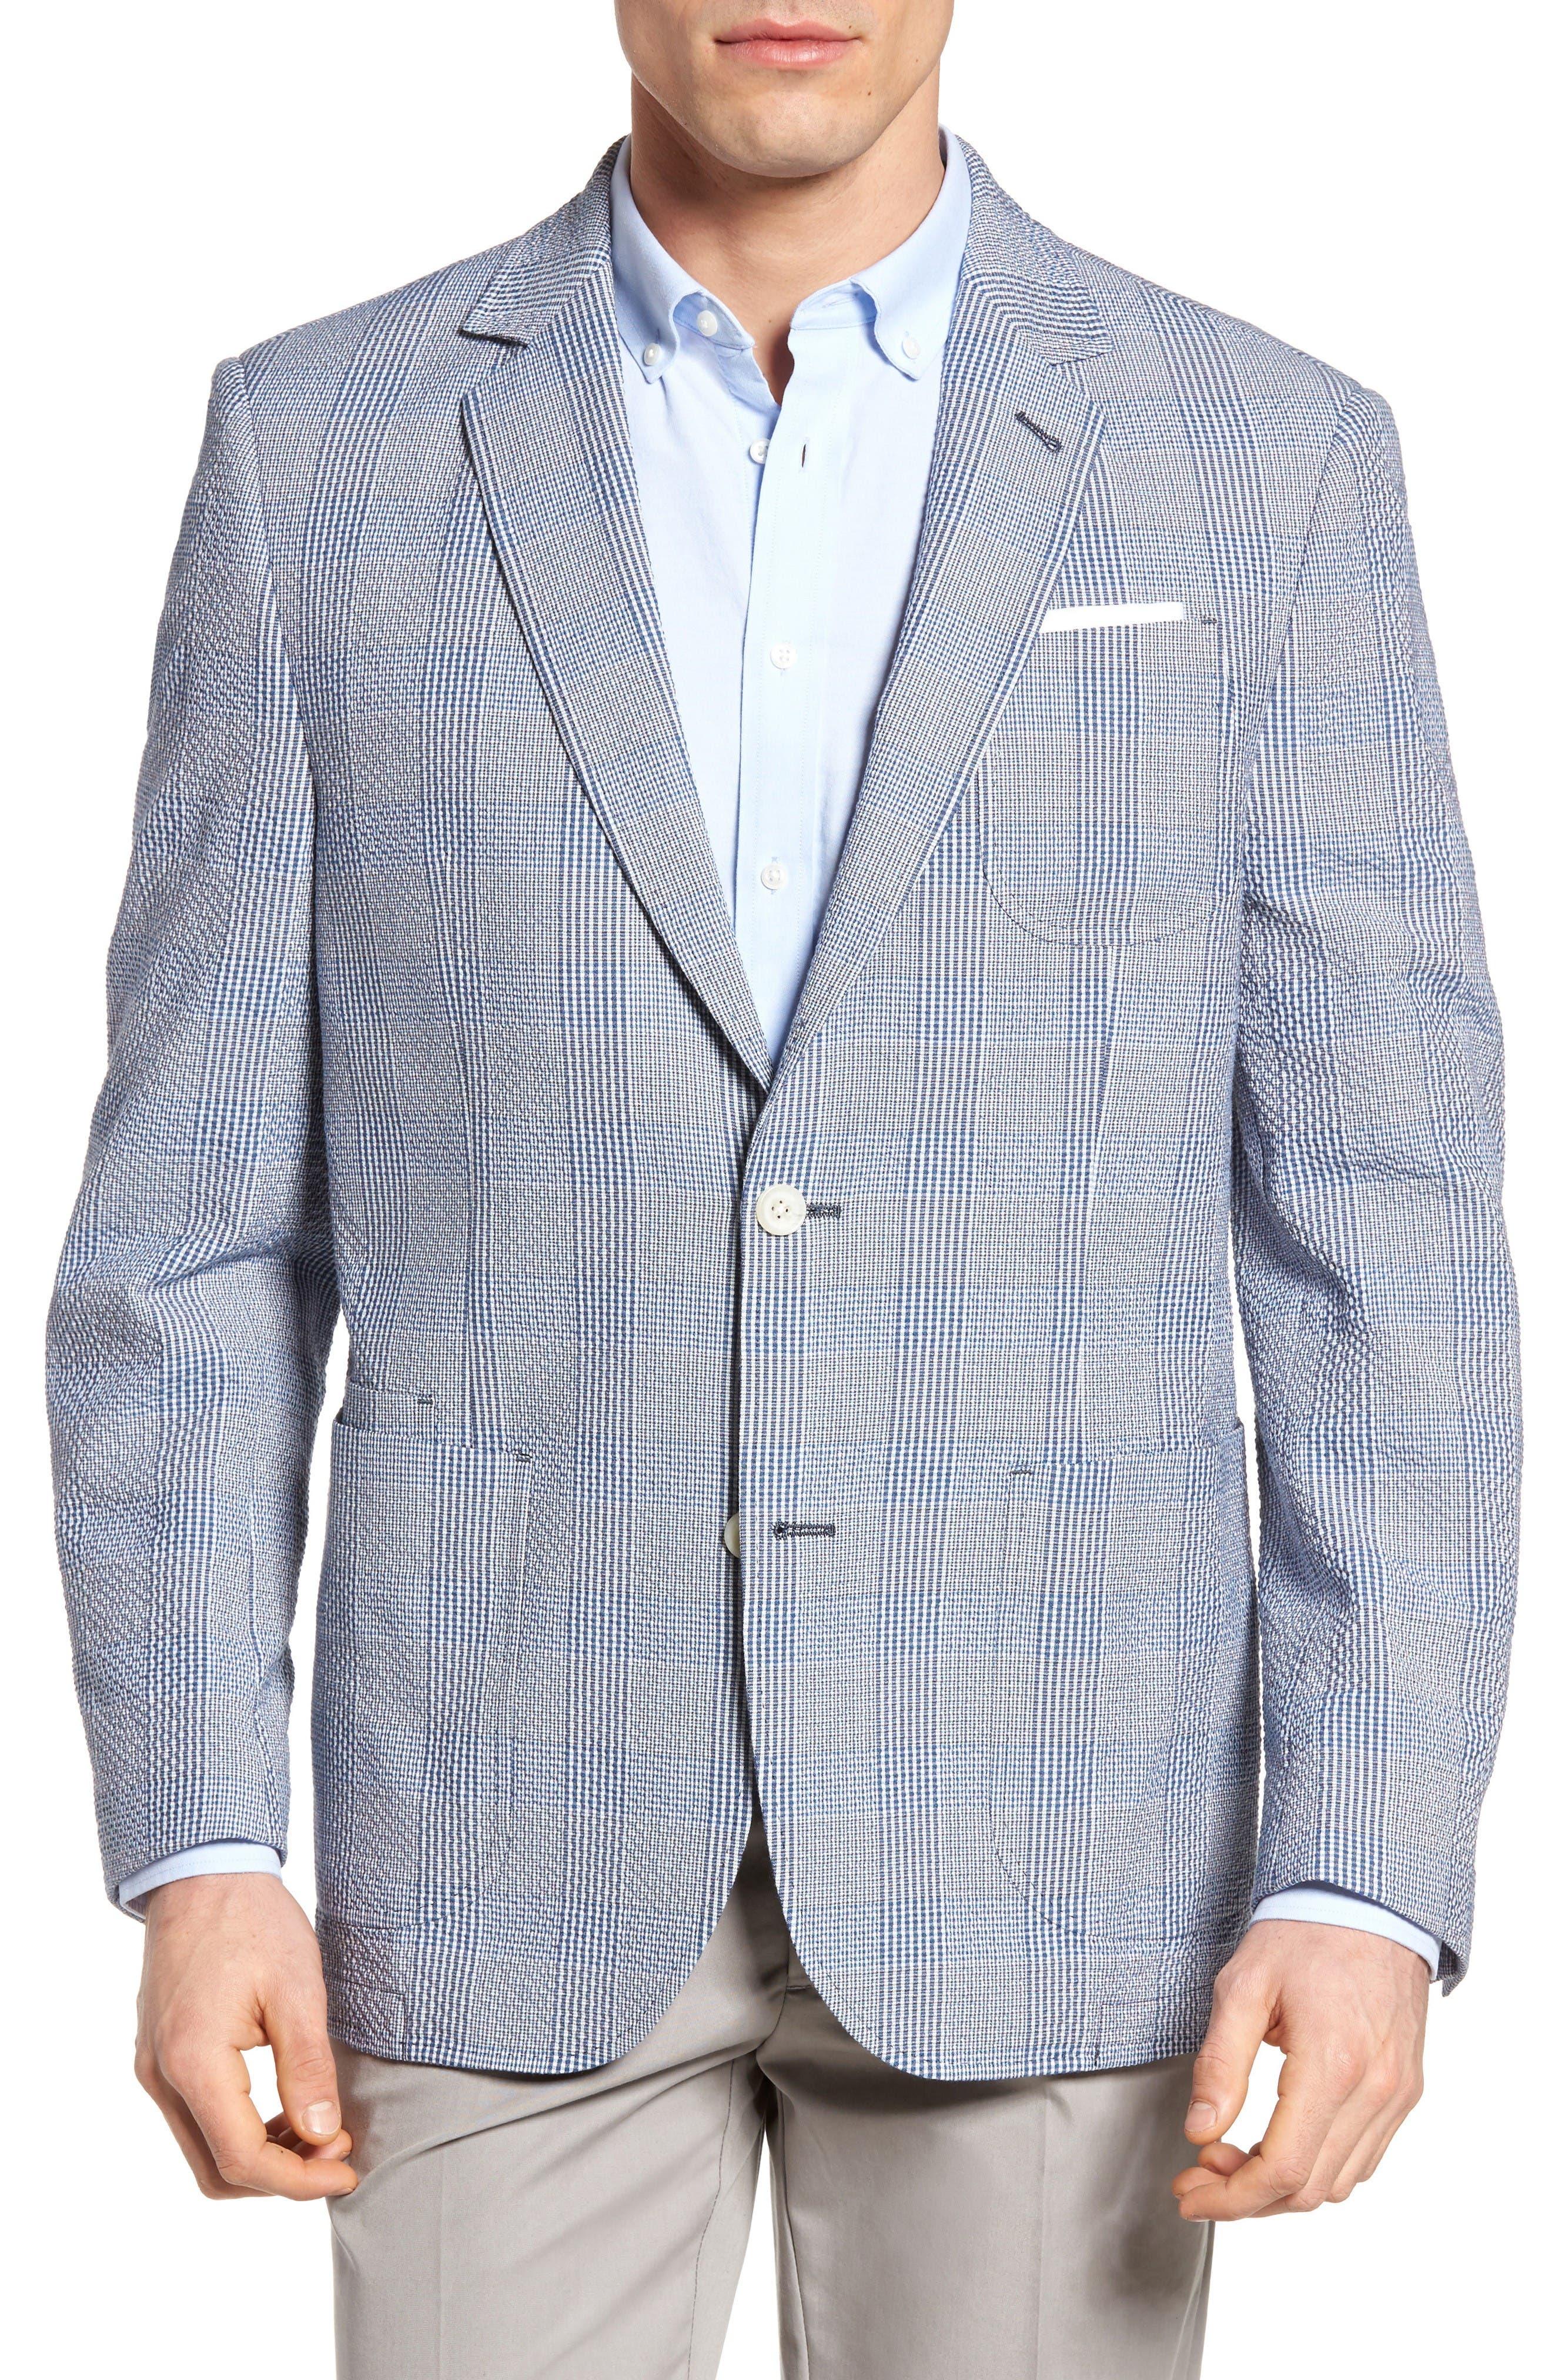 Main Image - FLYNT Babbitt Plaid Seersucker Sport Coat